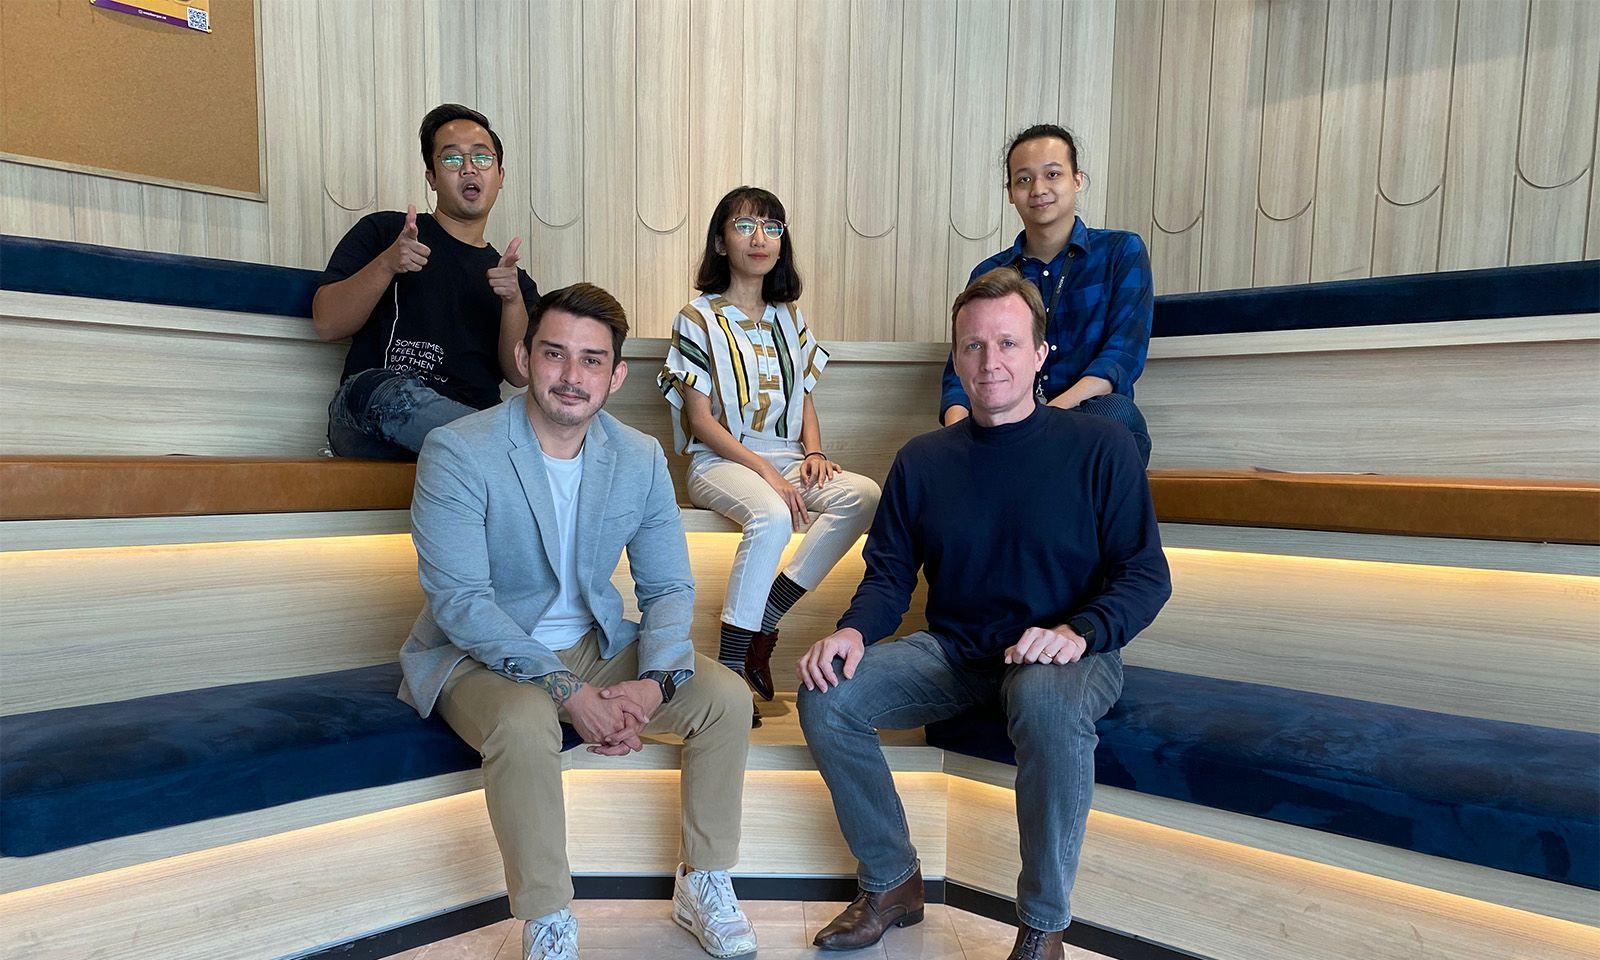 Jagofon Hadirkan Platform E-commerce Ponsel Bekas, Fasilitasi Pengujian Kualitas